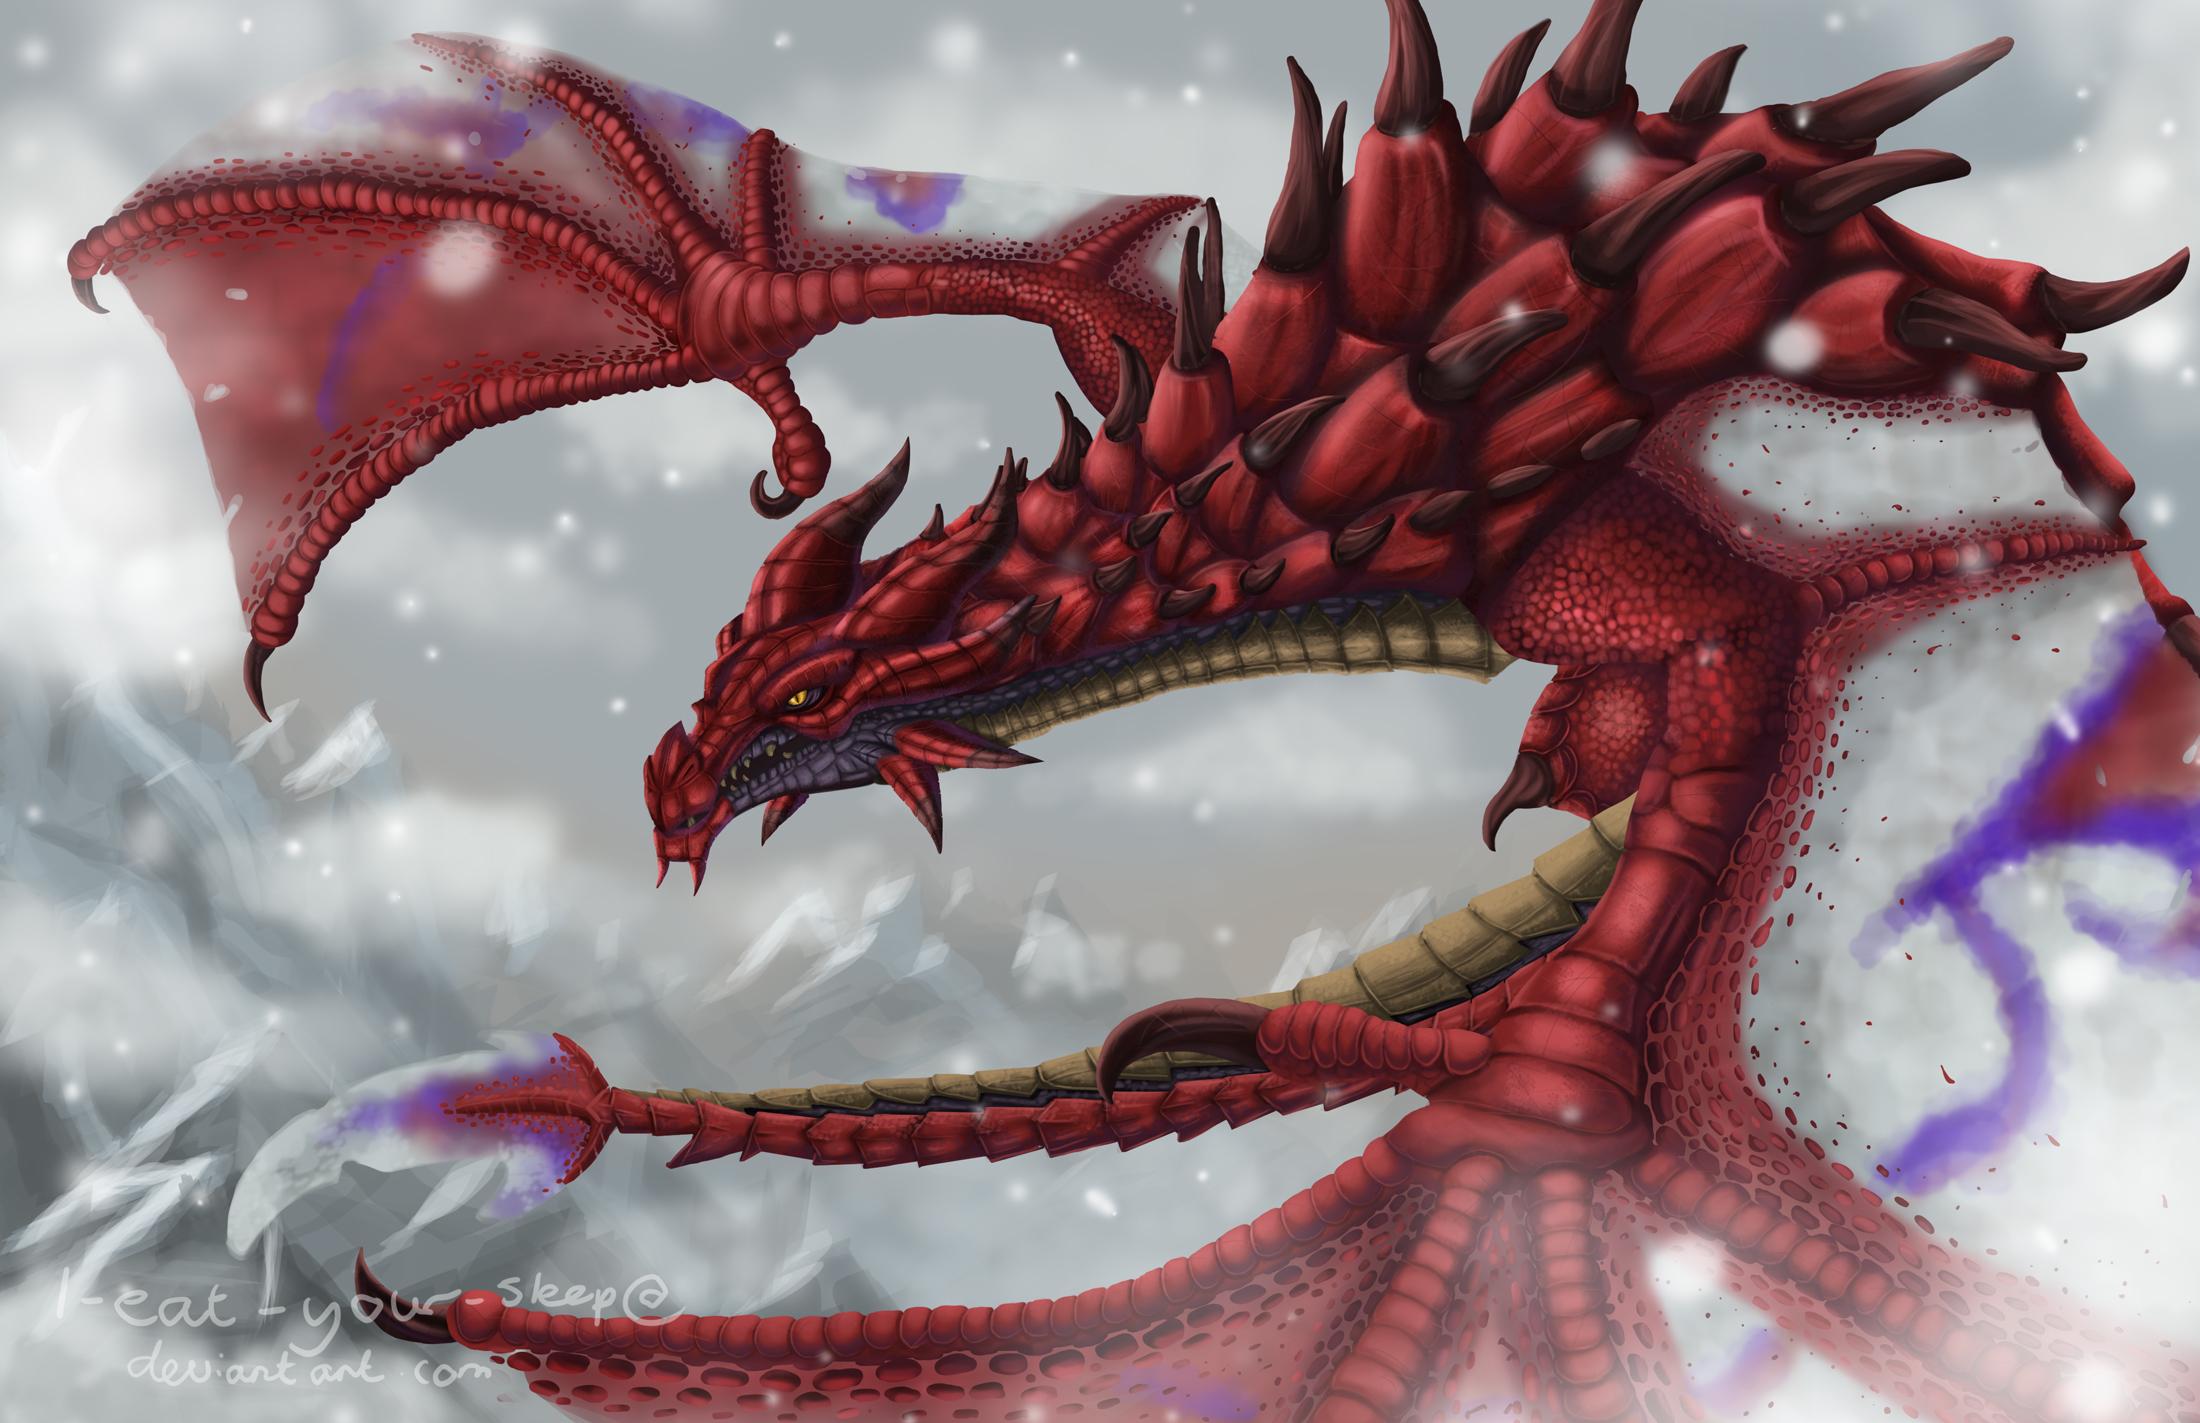 Skyrim: Odahviing by Somnusvorus